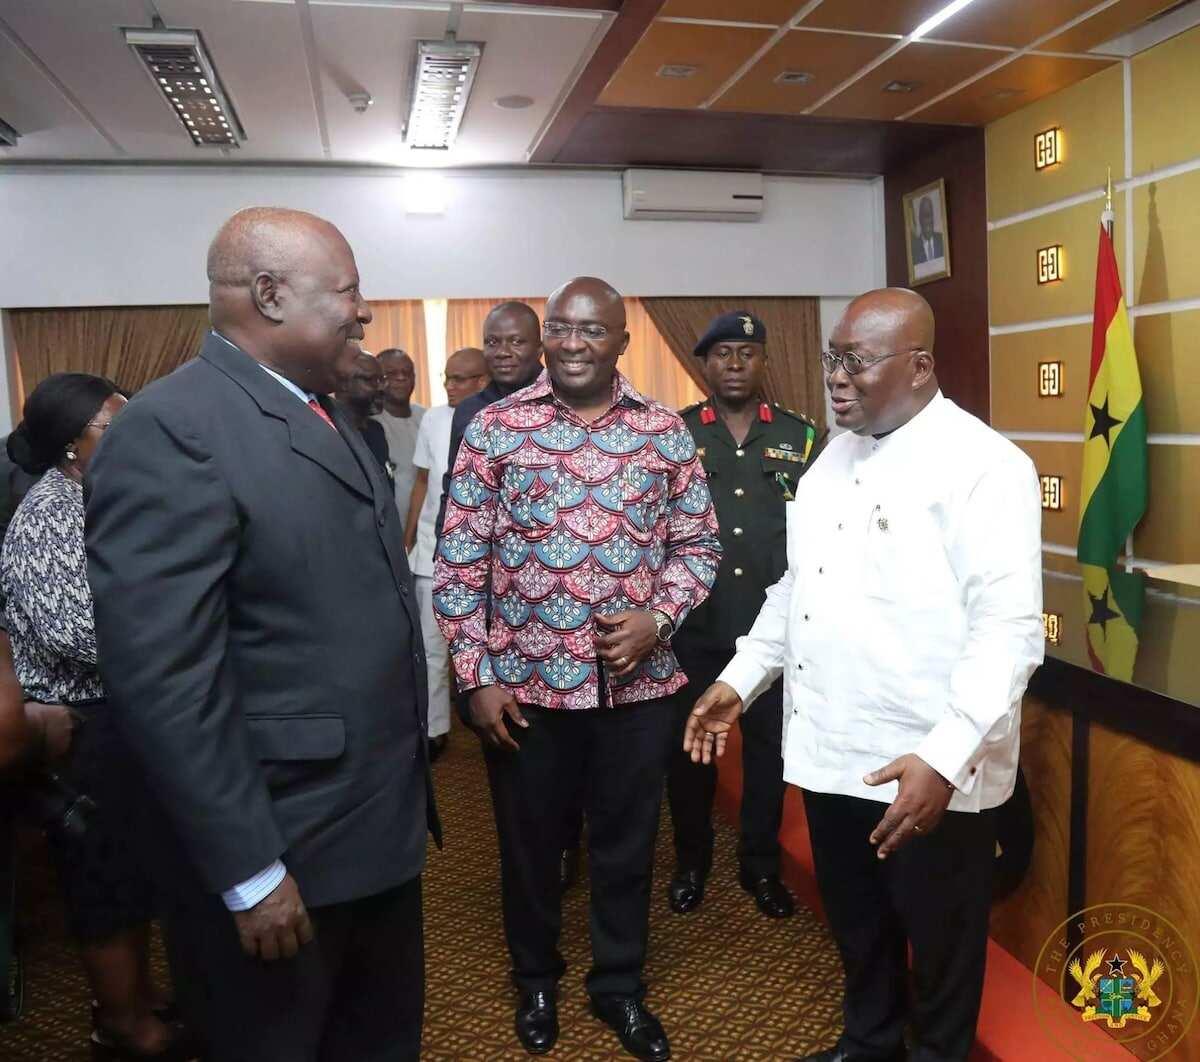 Martin Amidu with Vice President Bawumia and President Akufo-Addo